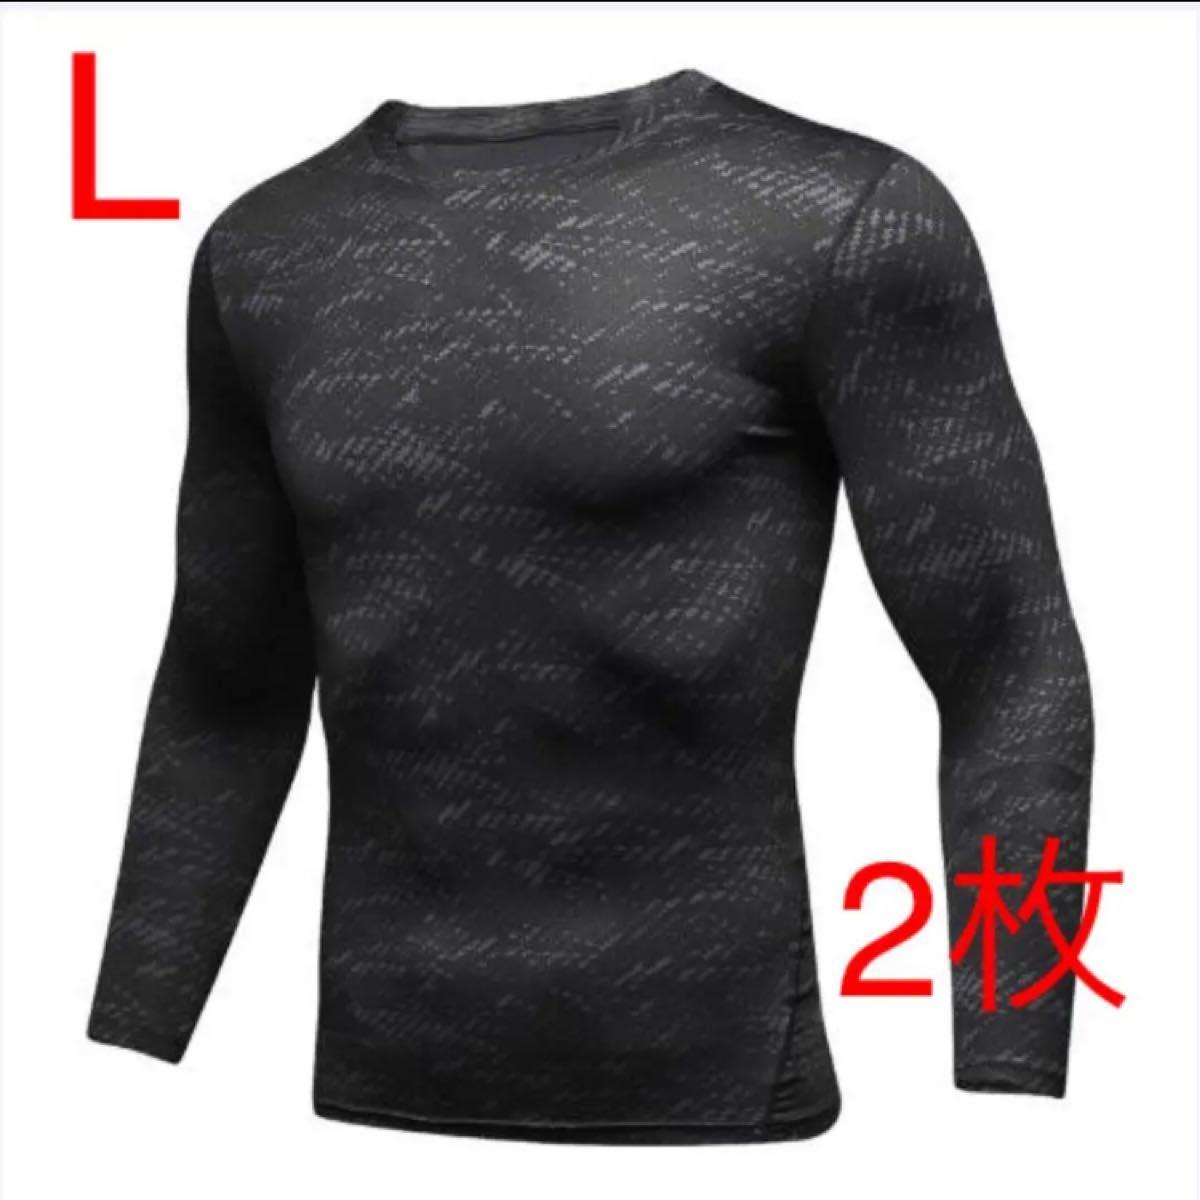 【L 2枚セット】 コンプレッションウェア 加圧 インナー メンズ 長袖 柄人気